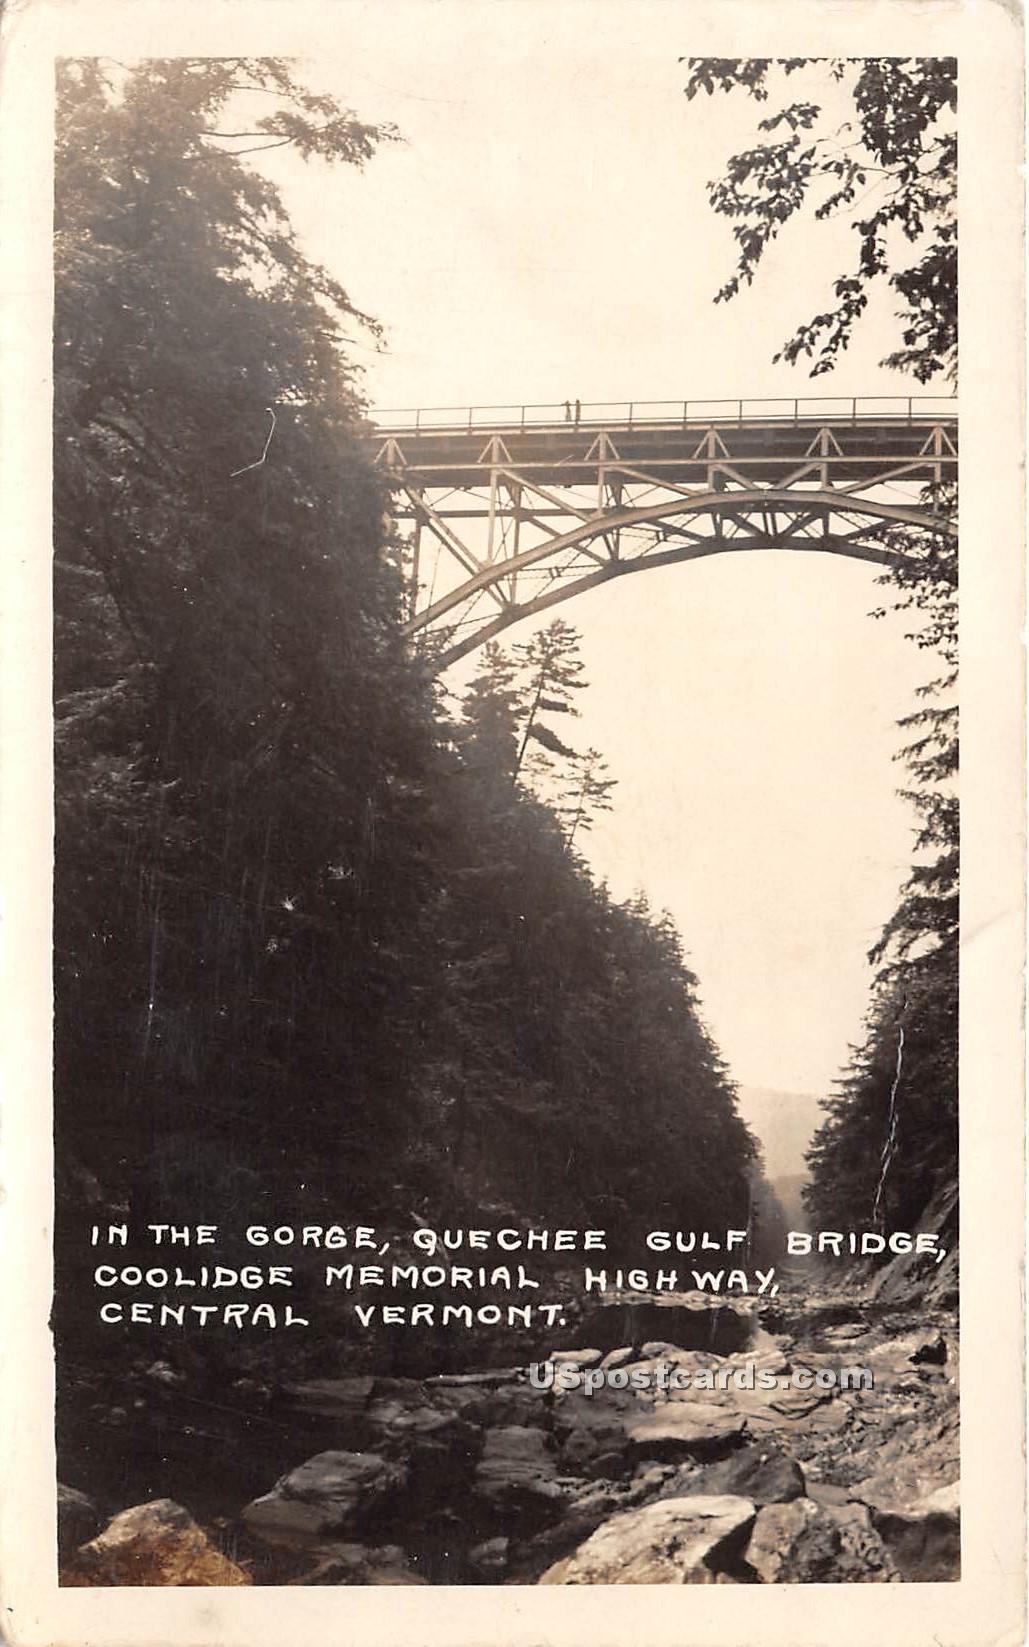 The Gorge - Coolidge Memorial Highway, Vermont VT Postcard